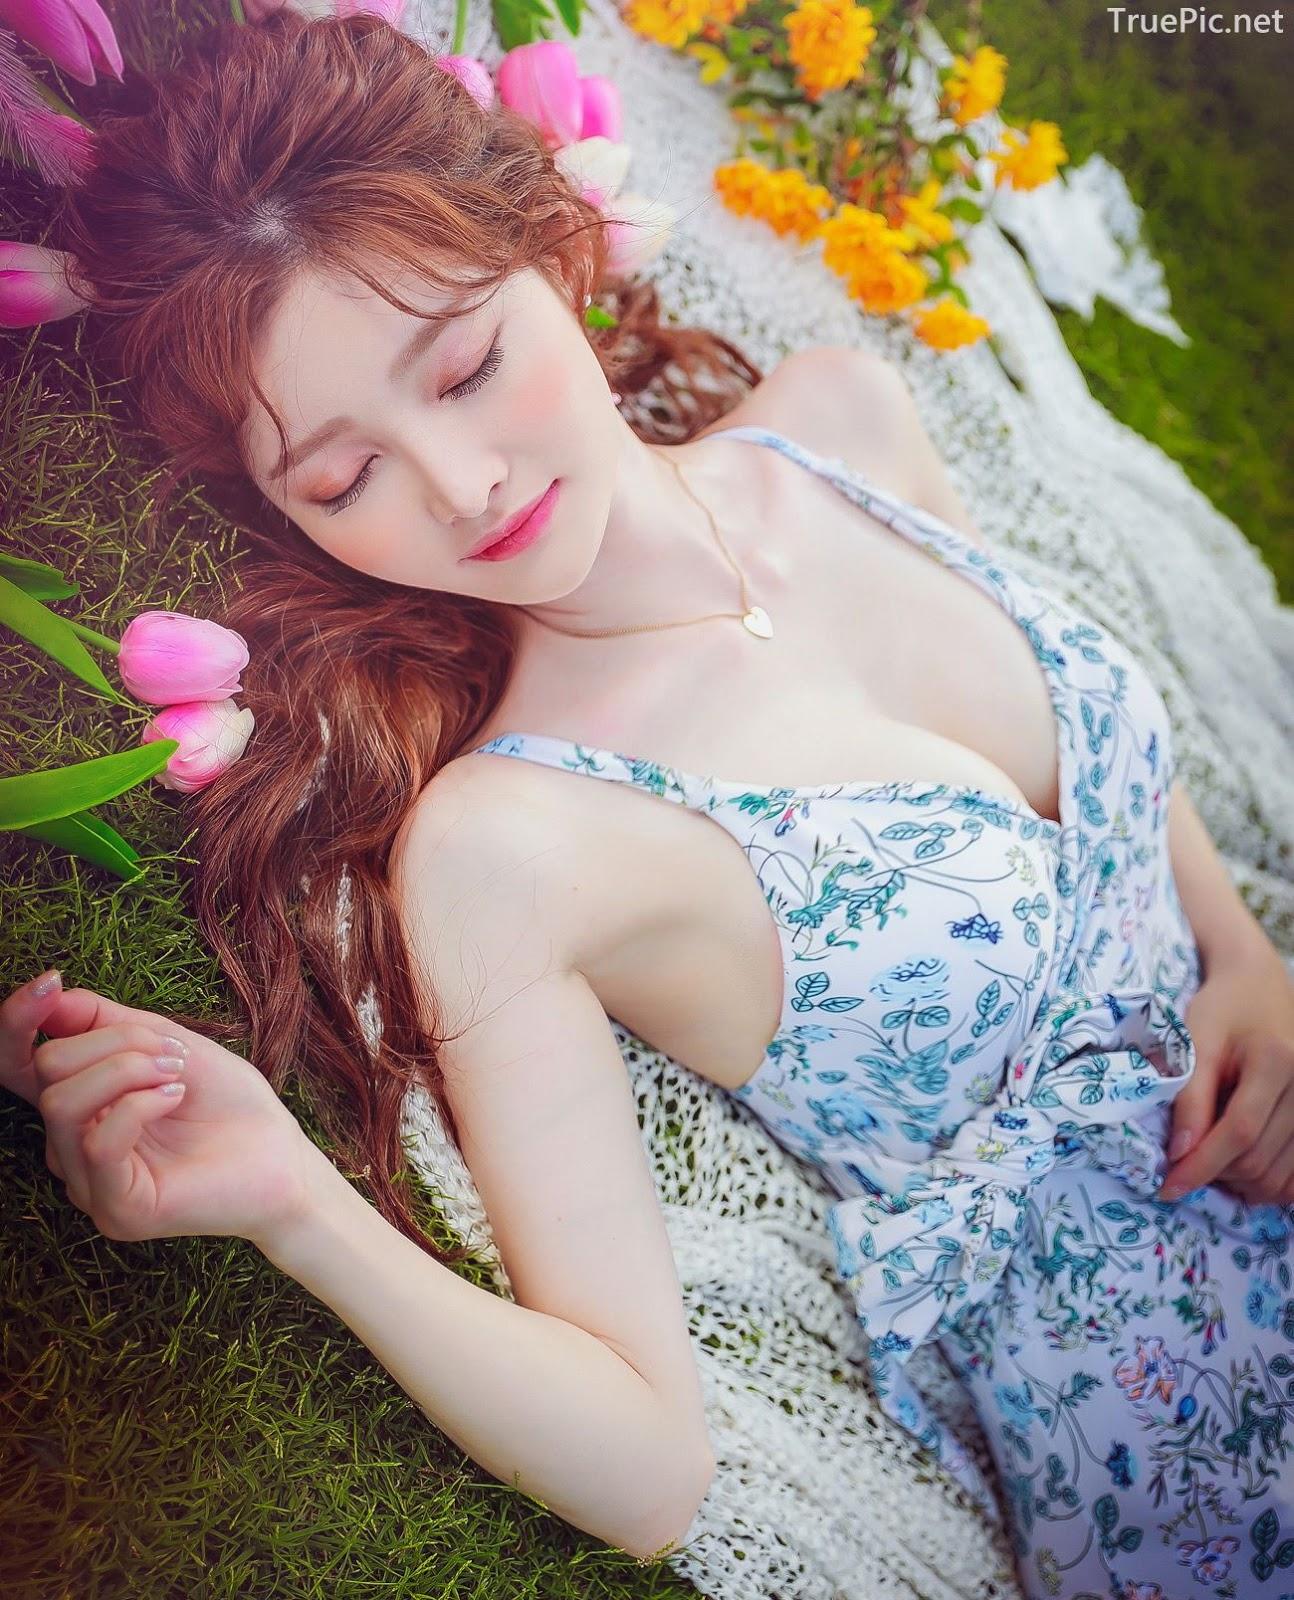 Korean lingerie queen Kim Hee Jeong - Floral Blue Monokini Swimsuit Set - Picture 1